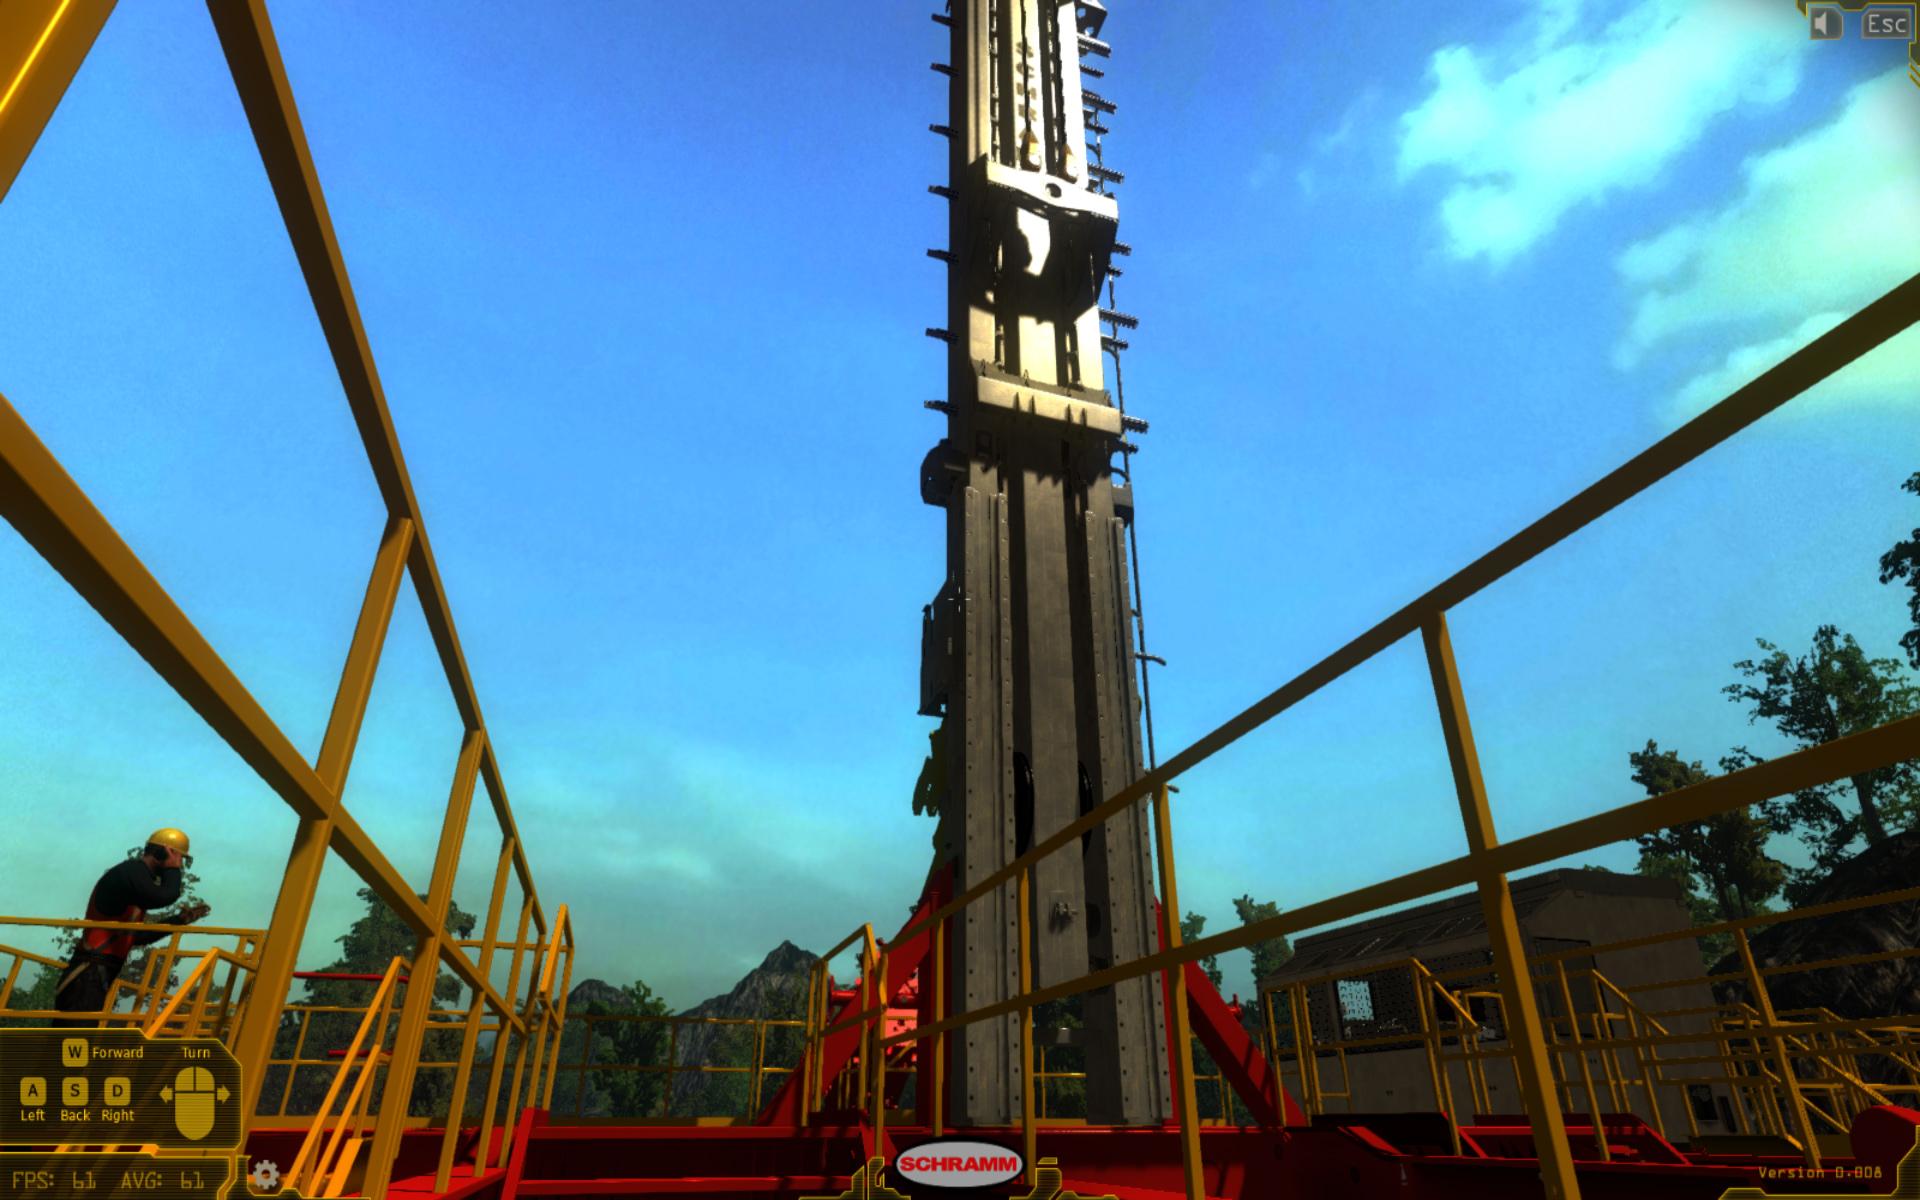 Heavy Hoist Drill-Simulation Based Training